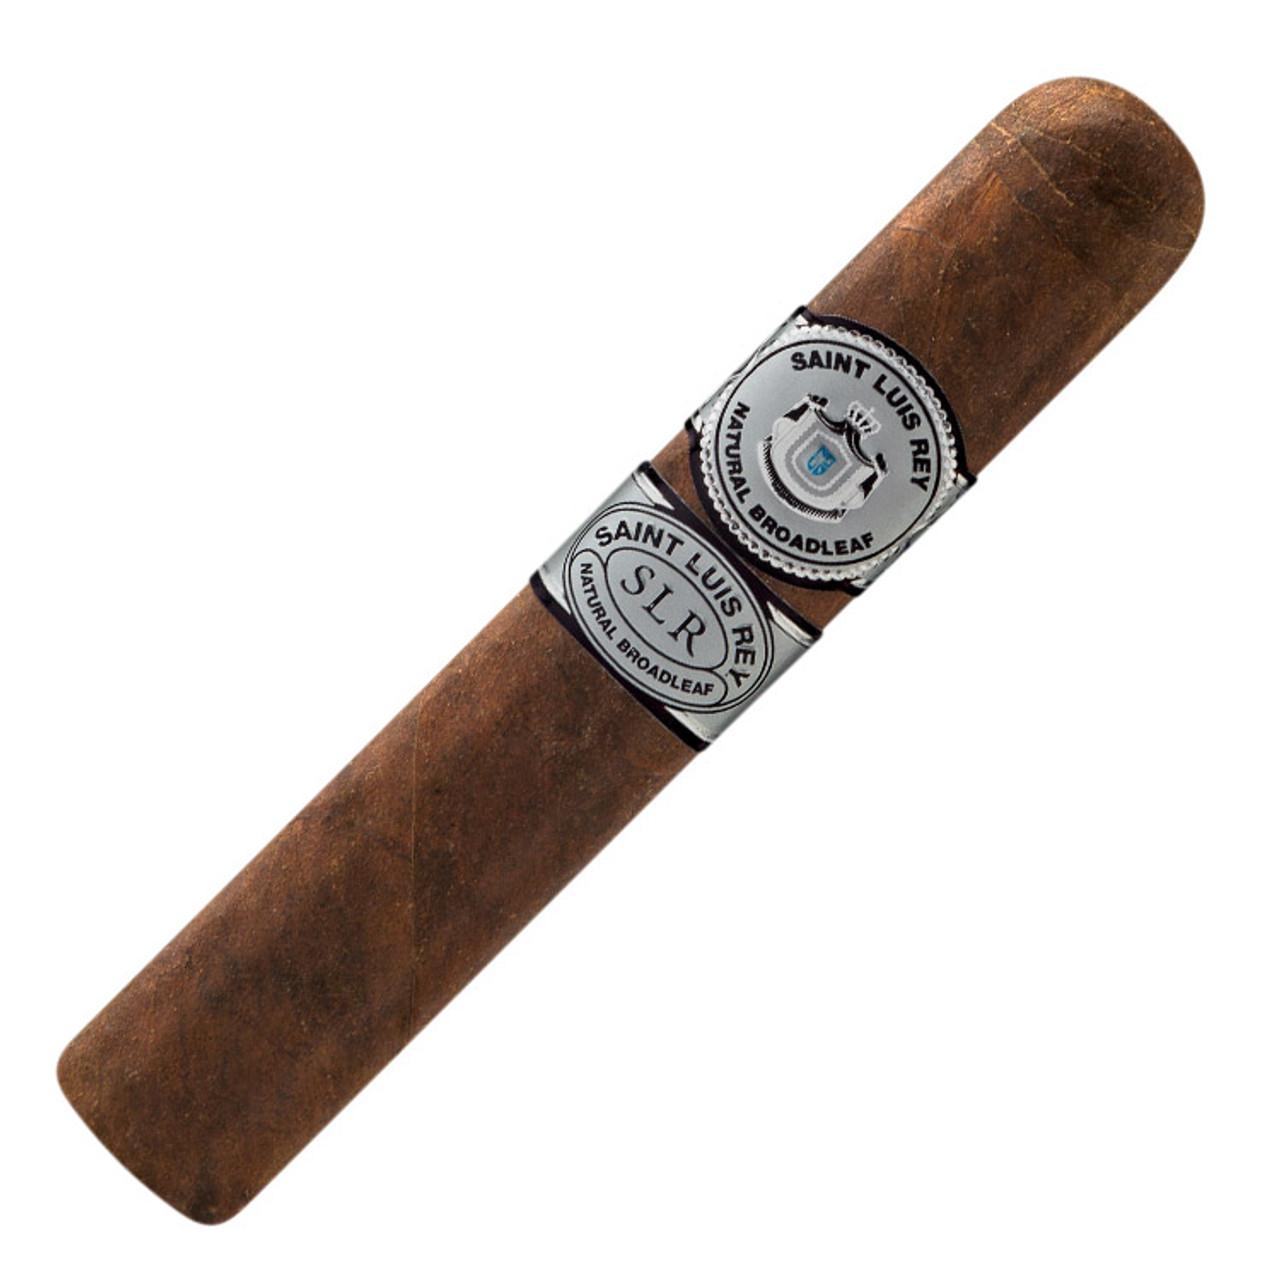 Saint Luis Rey Natural Broadleaf Rothchilde Cigars - 5 x 56 (Box of 25)